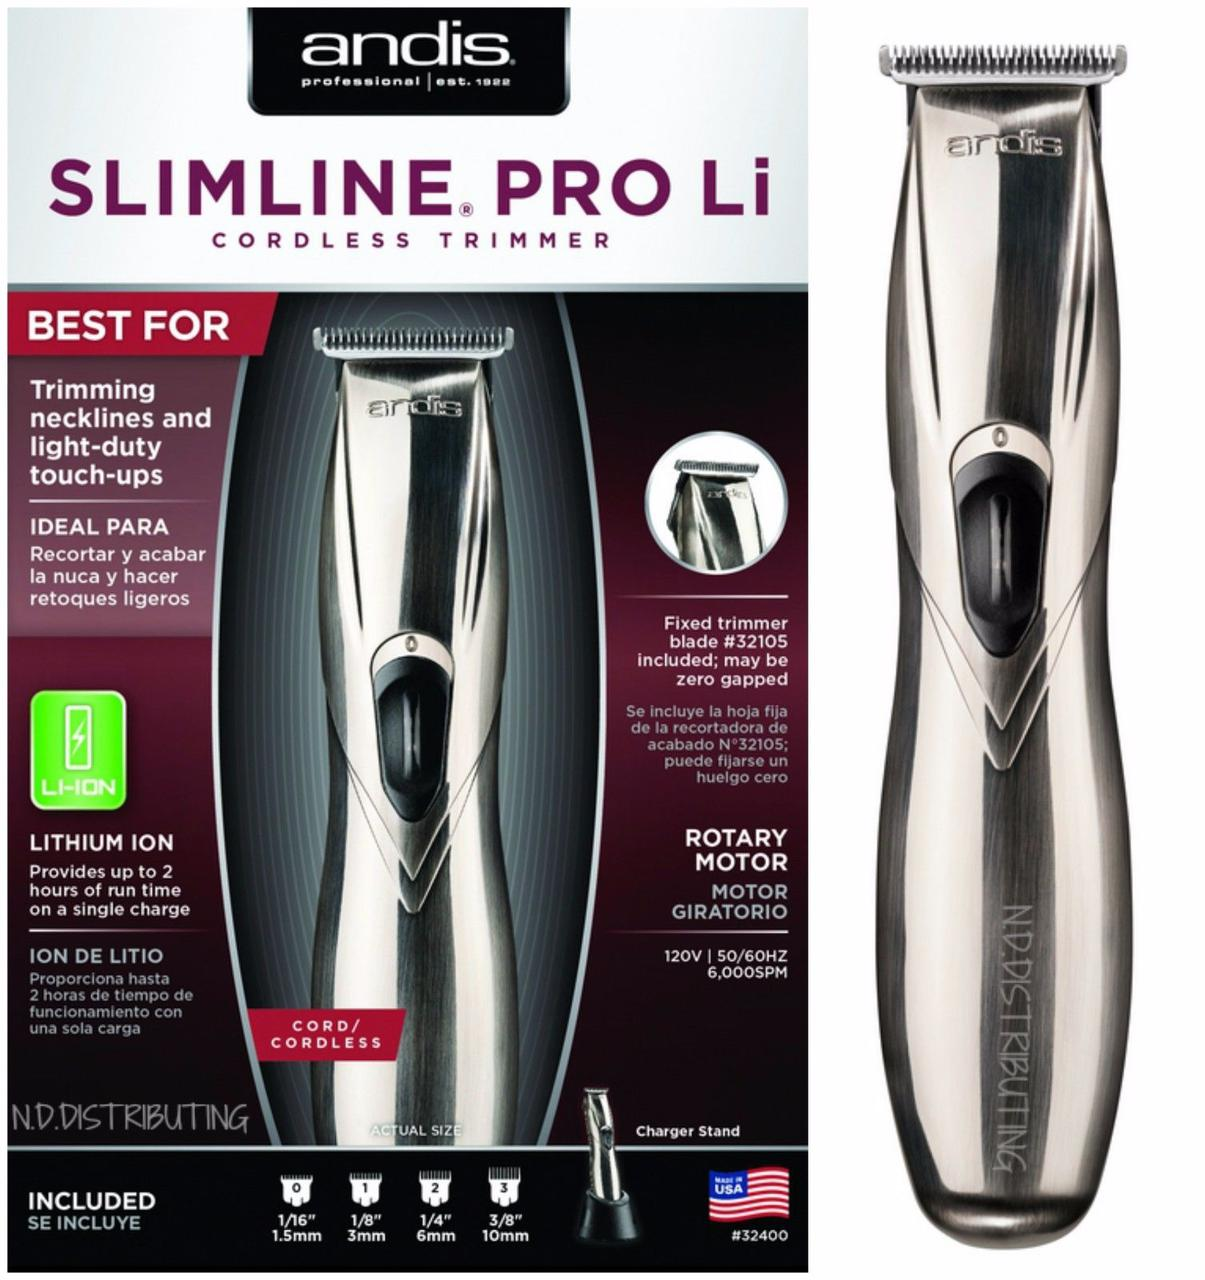 Триммер Andis Slimline Pro li D8 32445